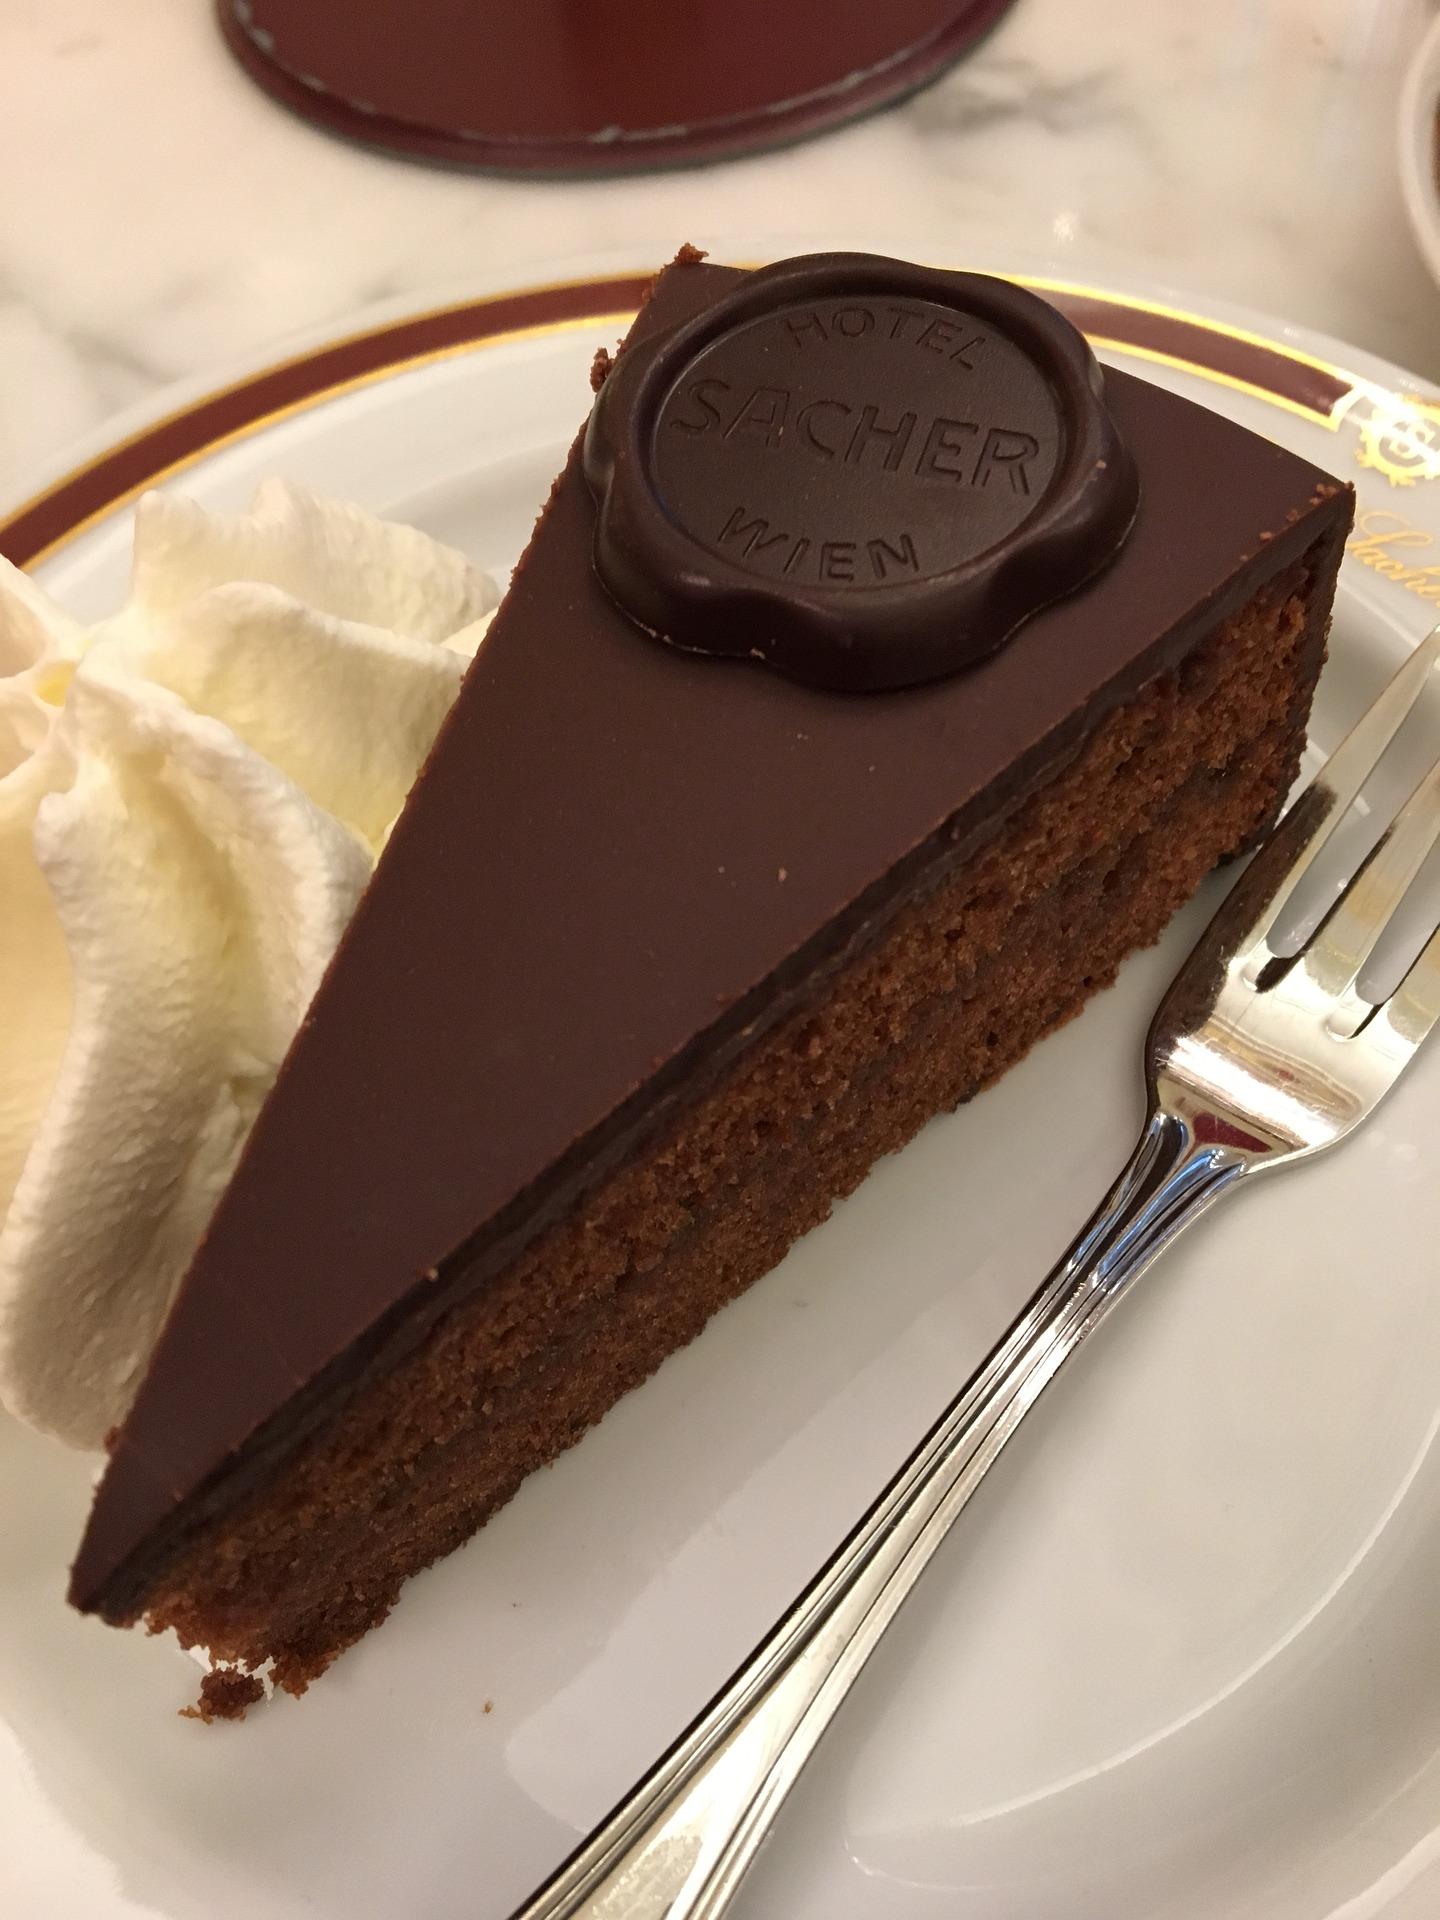 cake-3709491_1920.jpg